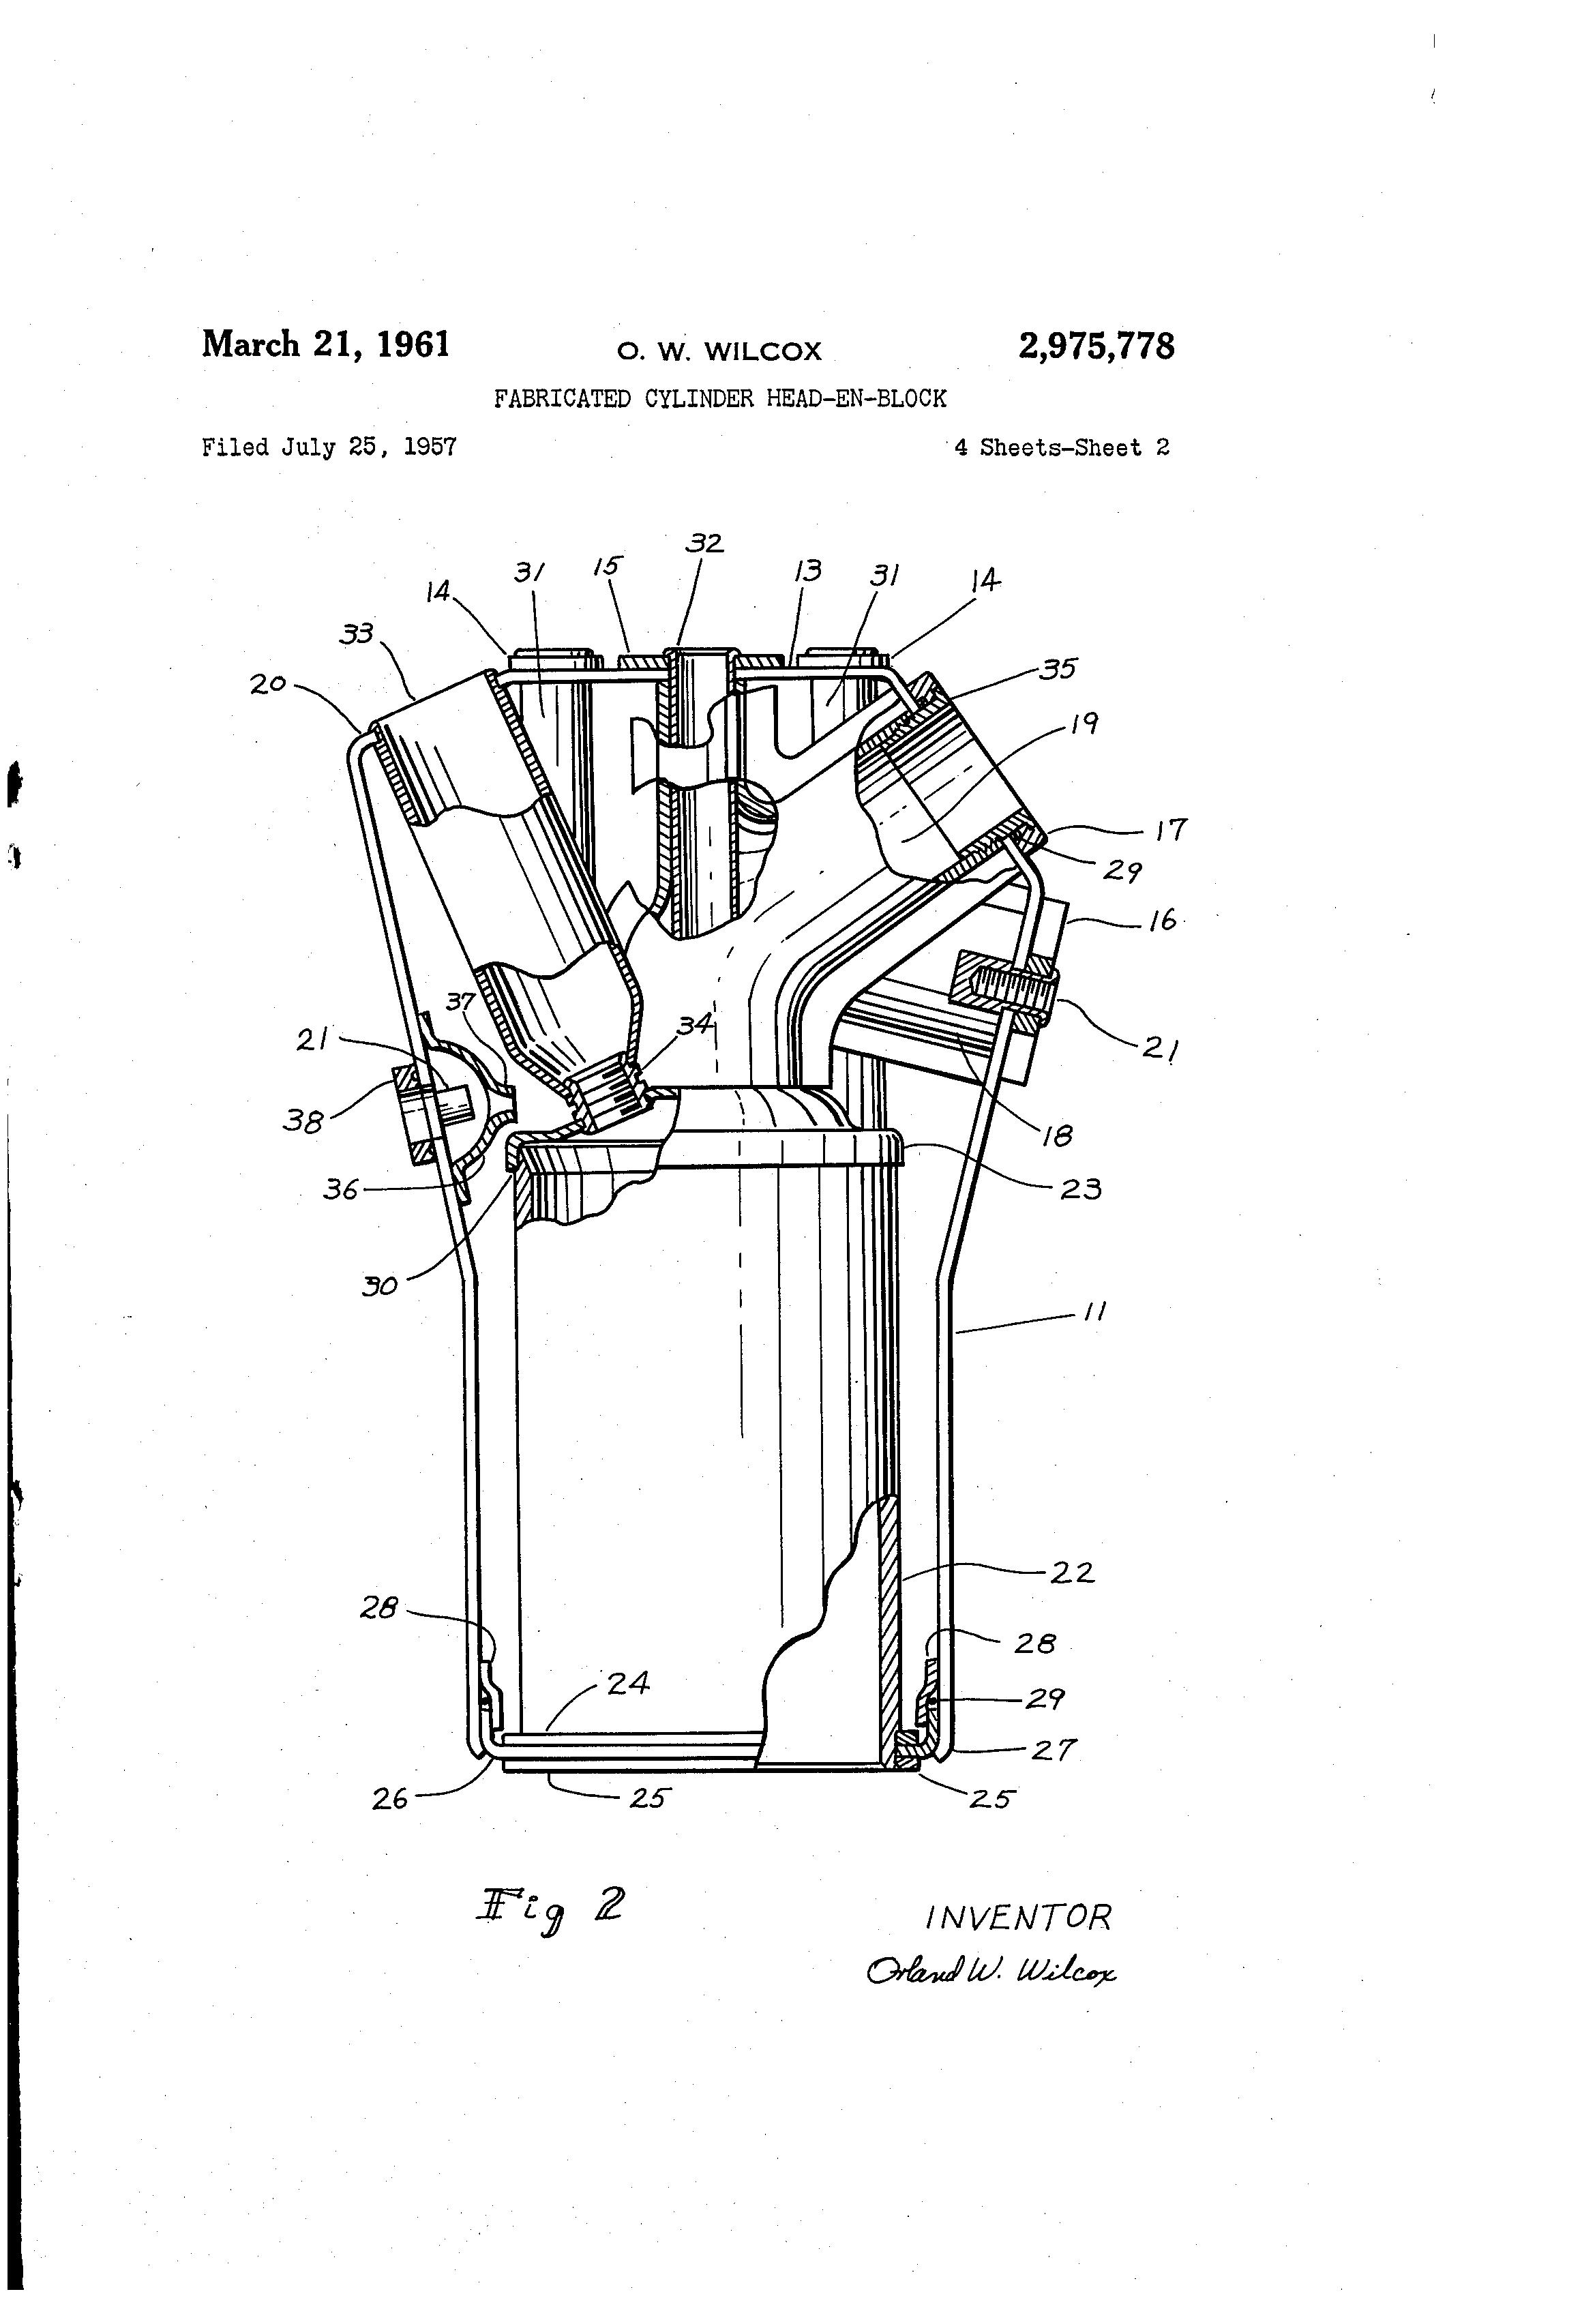 Brevet Us2975778 Fabricated Cylinder Head En Block Google Brevete Engine Water Jacket Diagram Patent Drawing